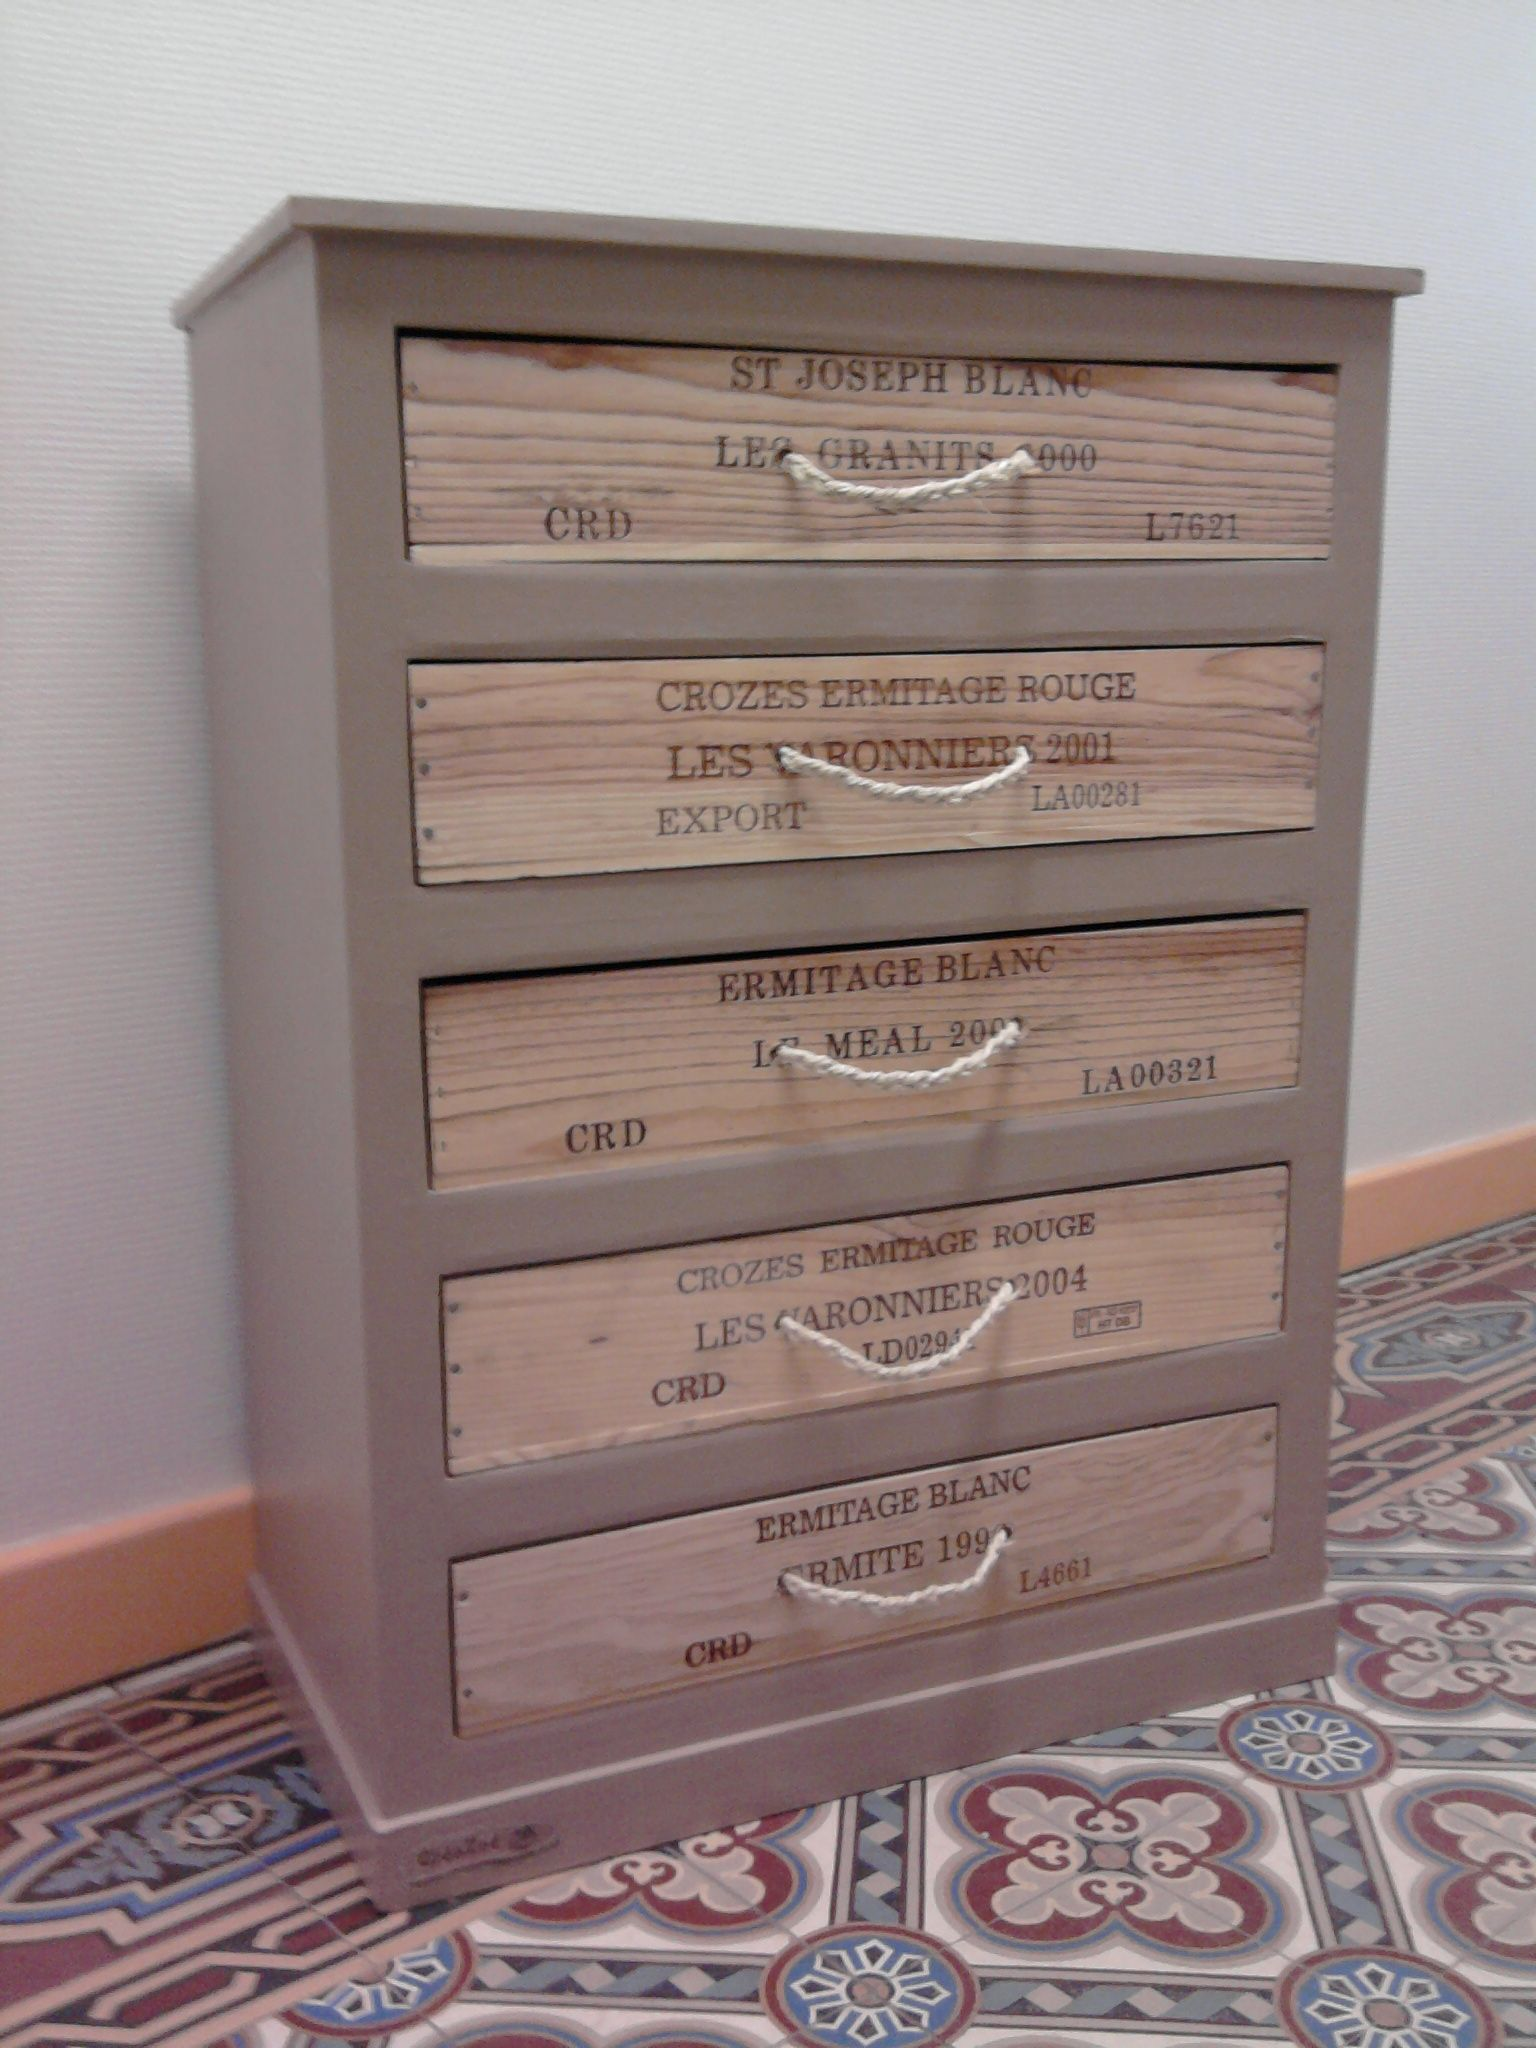 chiffonnier sidonie bricolage caisse caisse a vin et. Black Bedroom Furniture Sets. Home Design Ideas